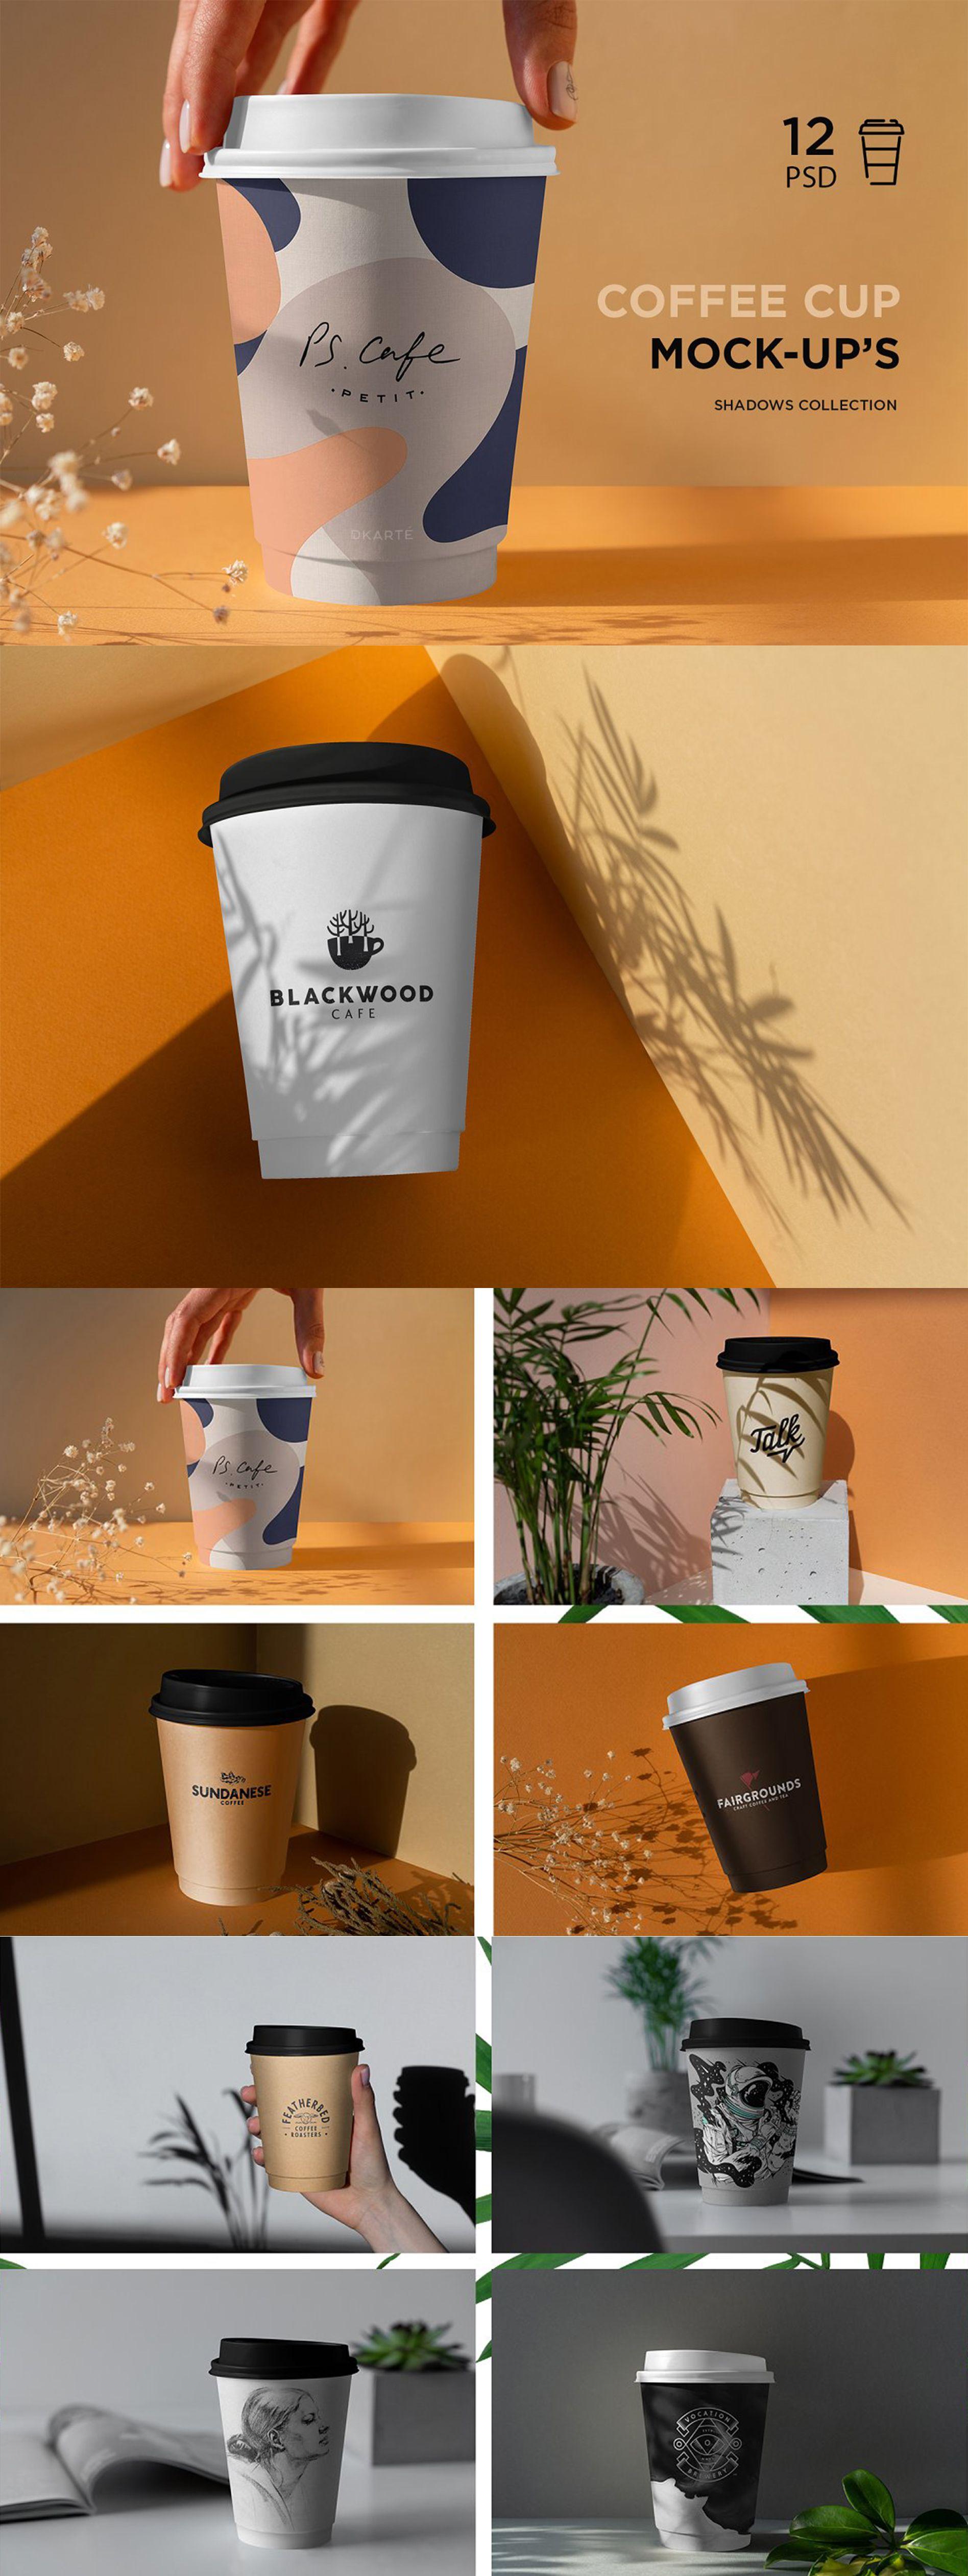 Coffee Cup Mockup Branding Design Mockups Psd Mockups Awesome Mockups Logo Mockups Design Coffee Cup Design Logo Design Mockup Coffee Branding Design